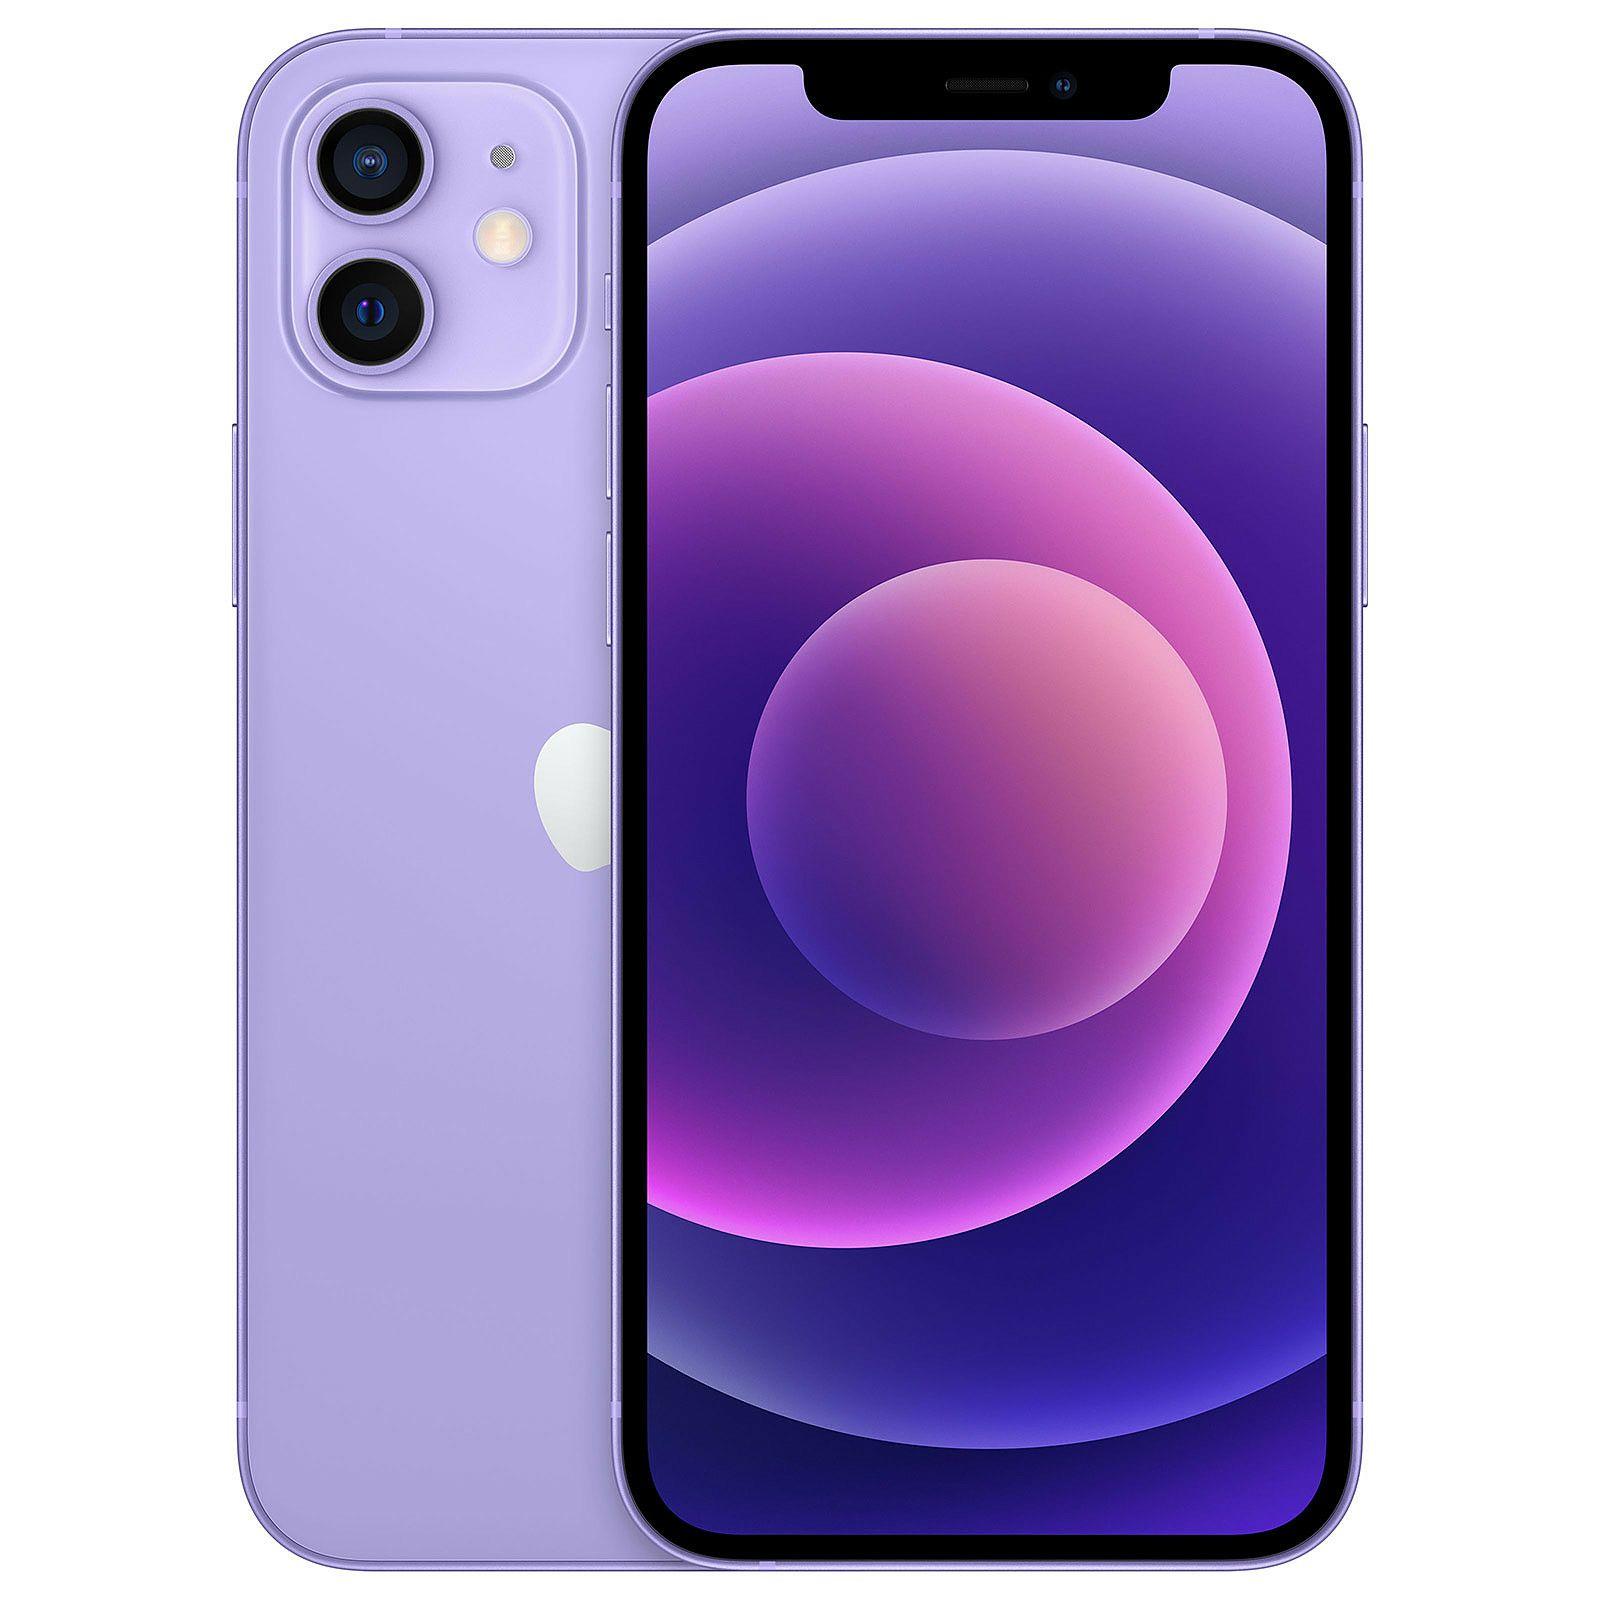 "Smartphone 6.1"" Apple iPhone 12 - 64 Go, 5G, Violet (Frontaliers Suisse)"